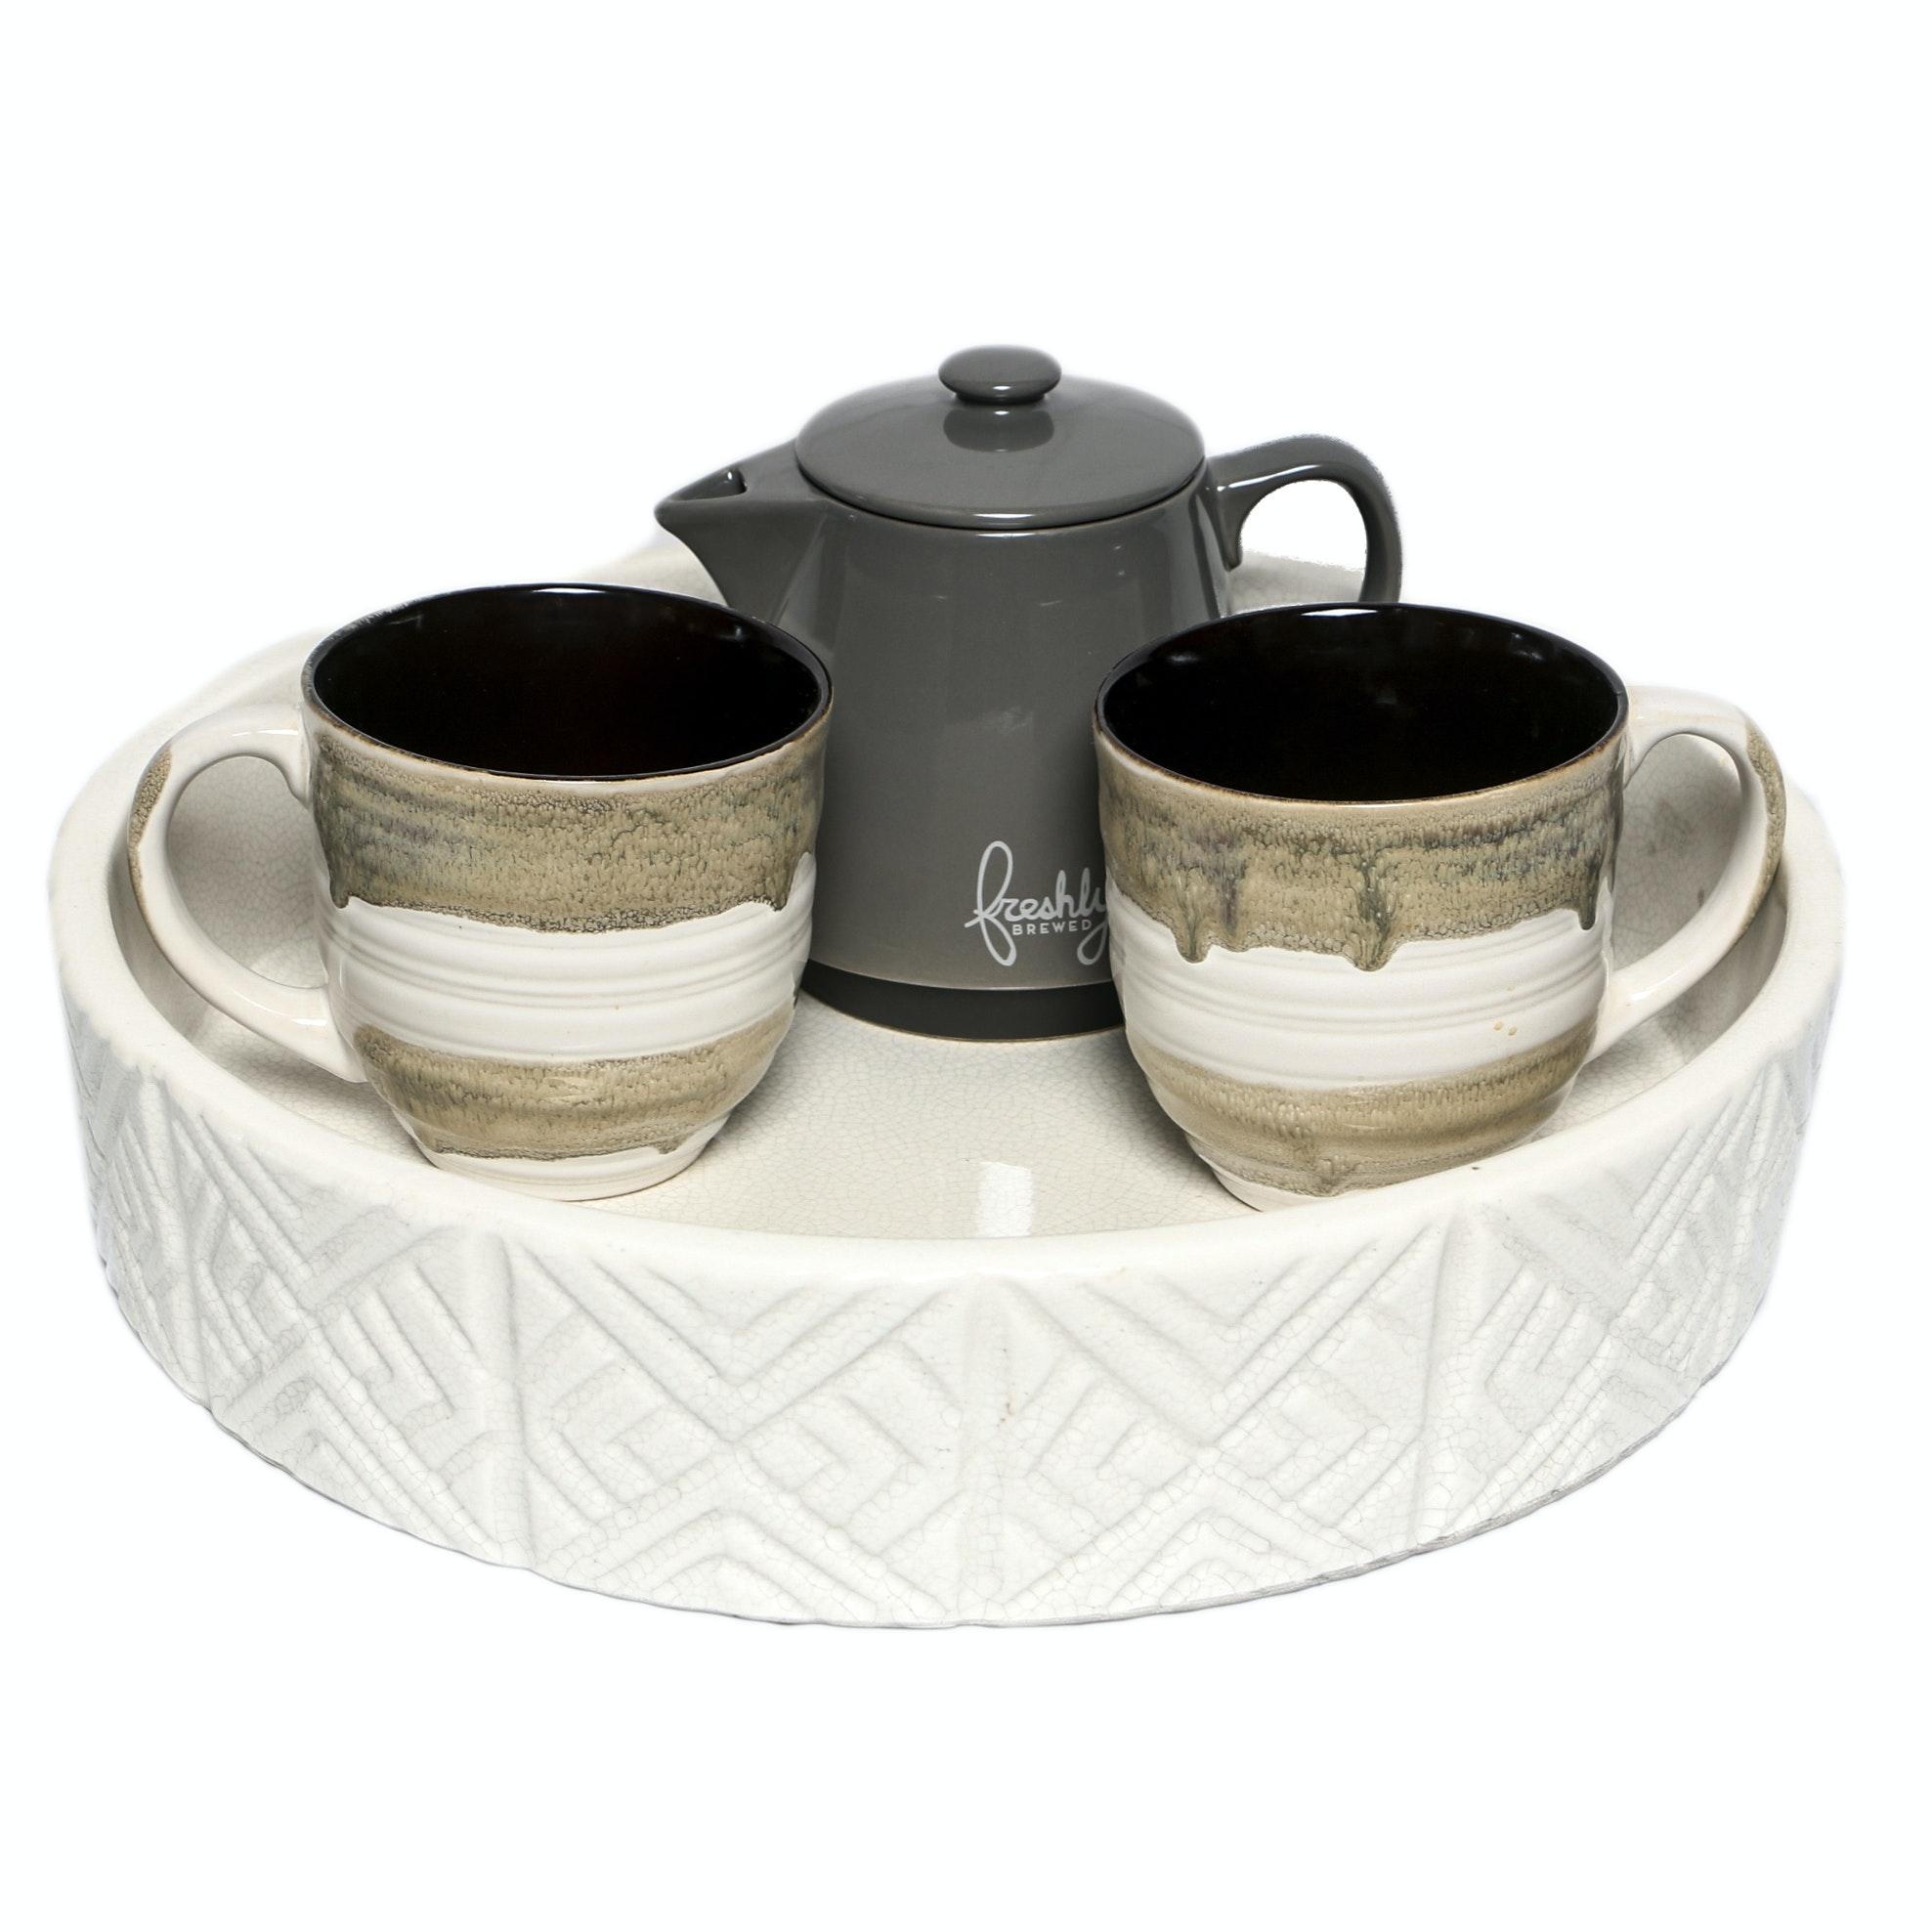 Ceramic Mugs, Coffee Pot, and Tray